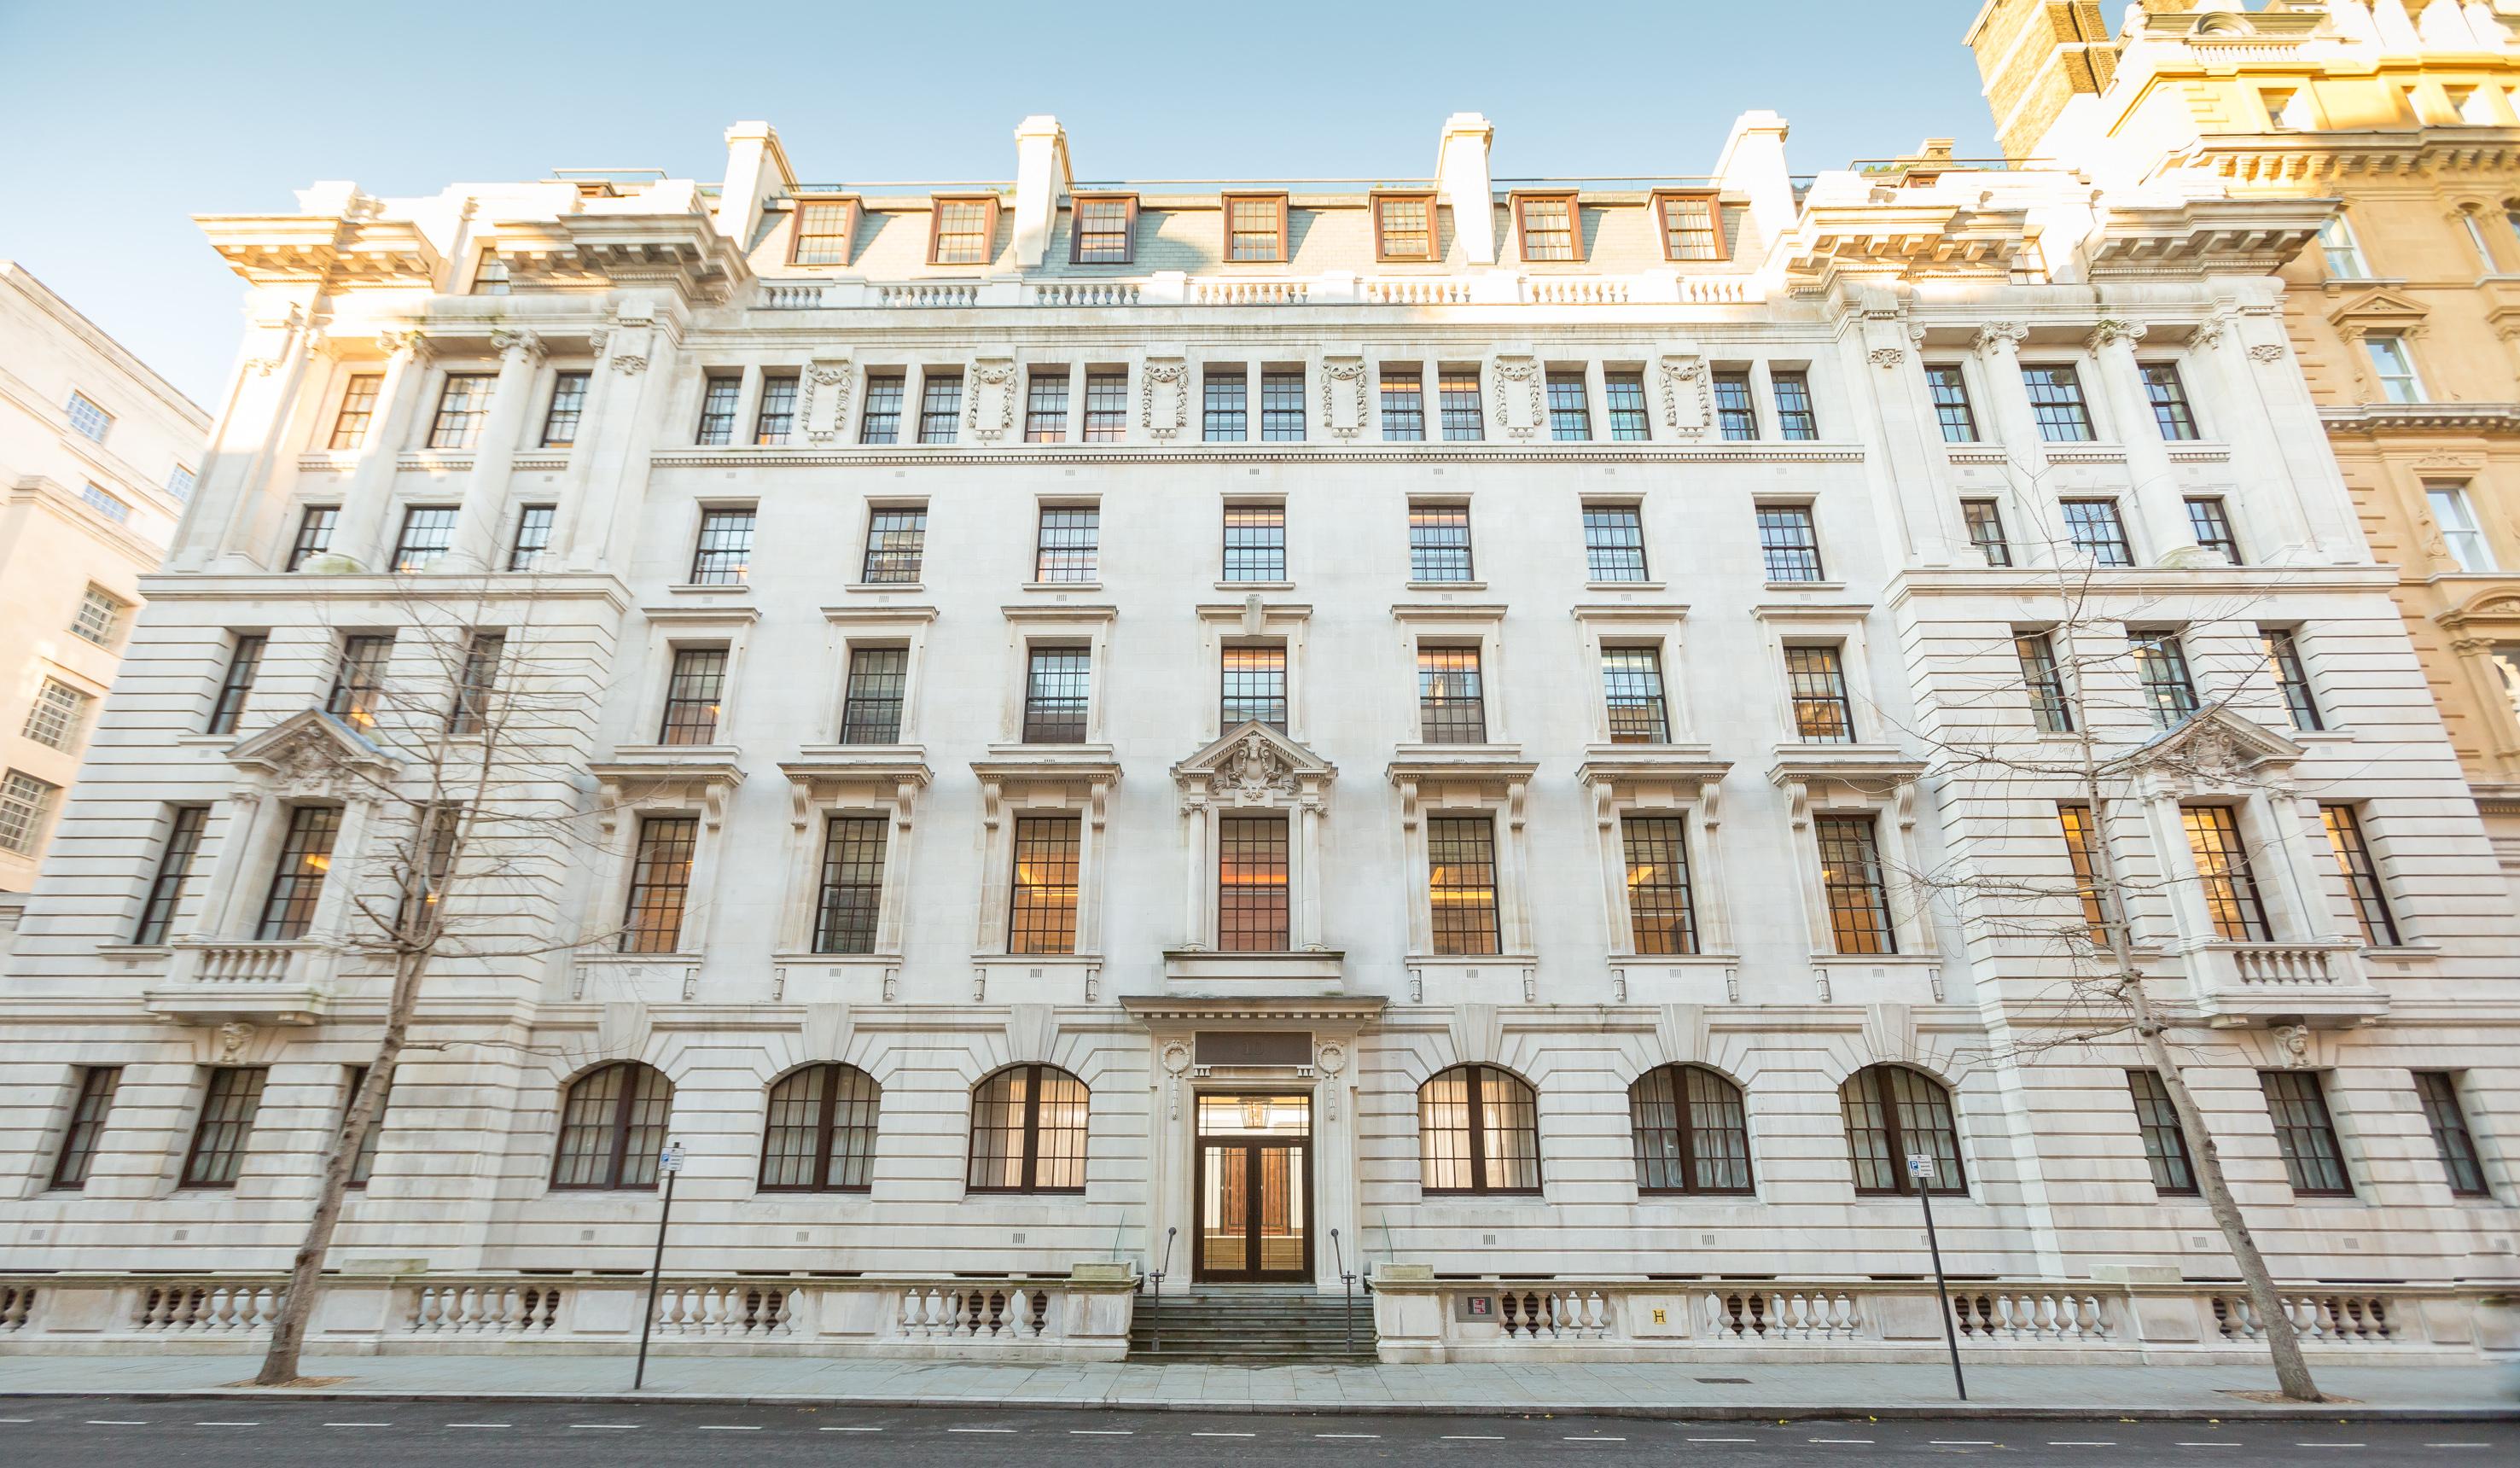 Corinthia Hotel Residences, 10 Whitehall Place